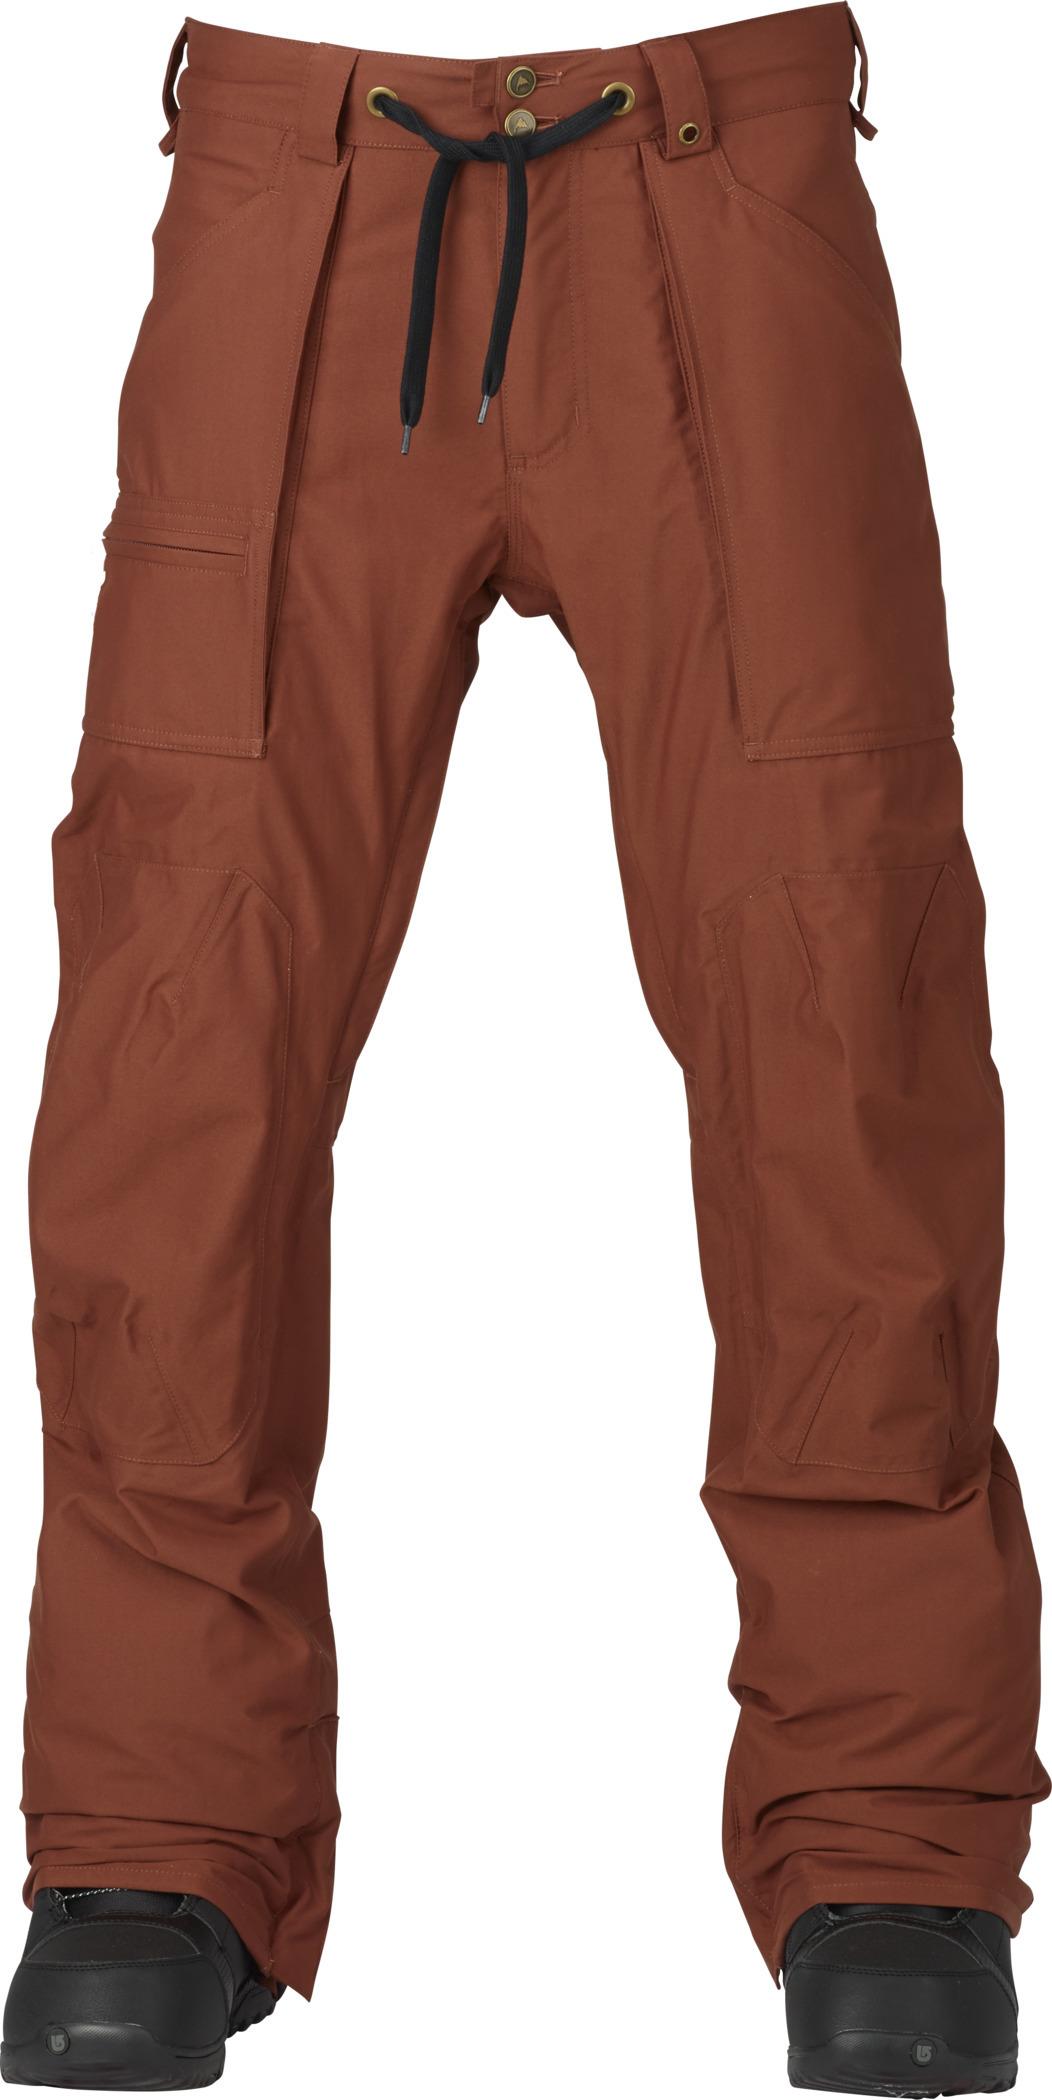 zimowe spodnie męskie BURTON SOUTHSIDE SLIM MATADOR